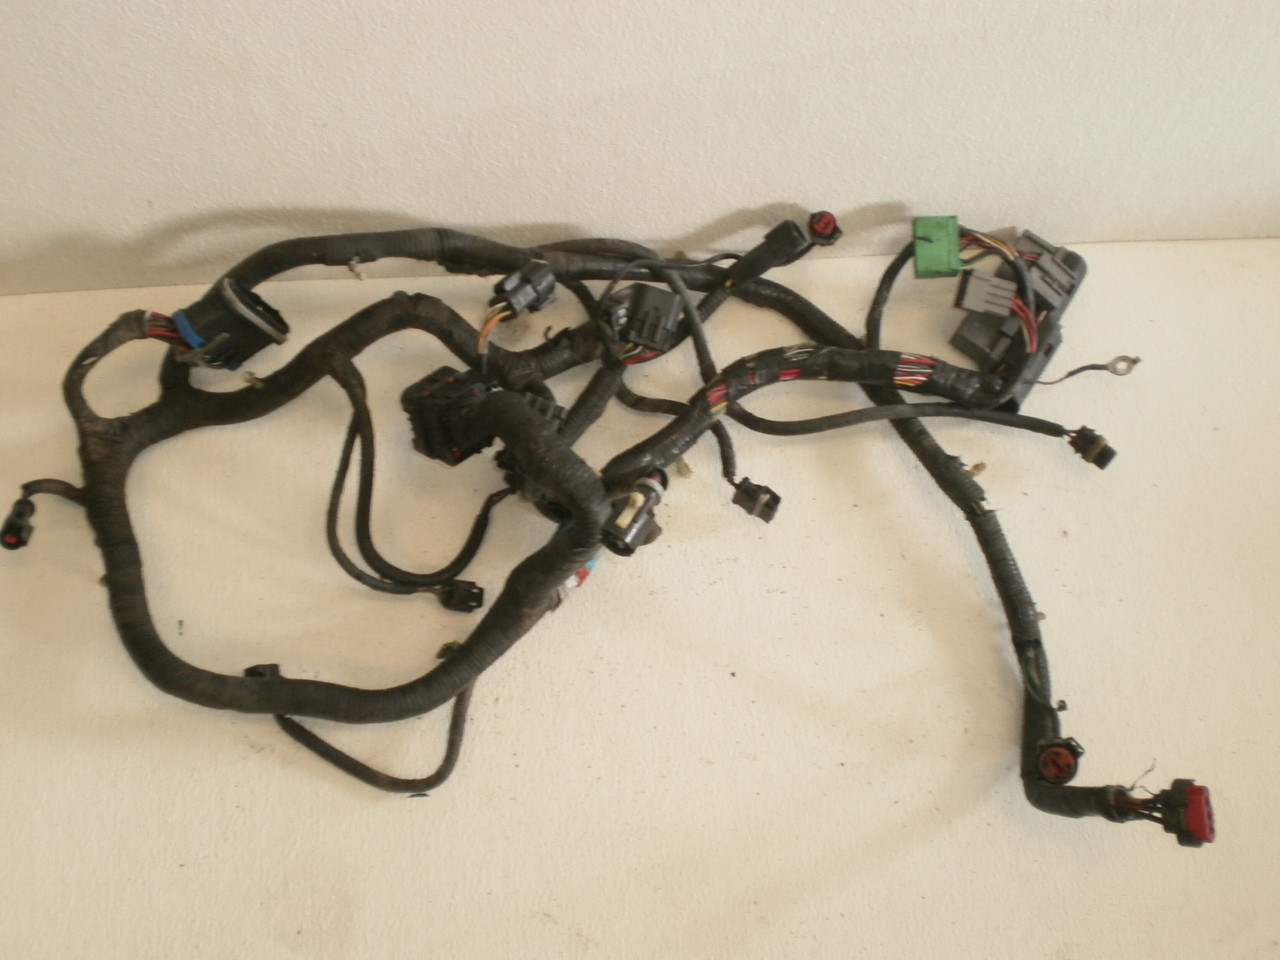 hight resolution of 2001 mustang alternator wiring harness wiring diagram schematics 2001 mustang radio wiring harness 01 mustang wiring